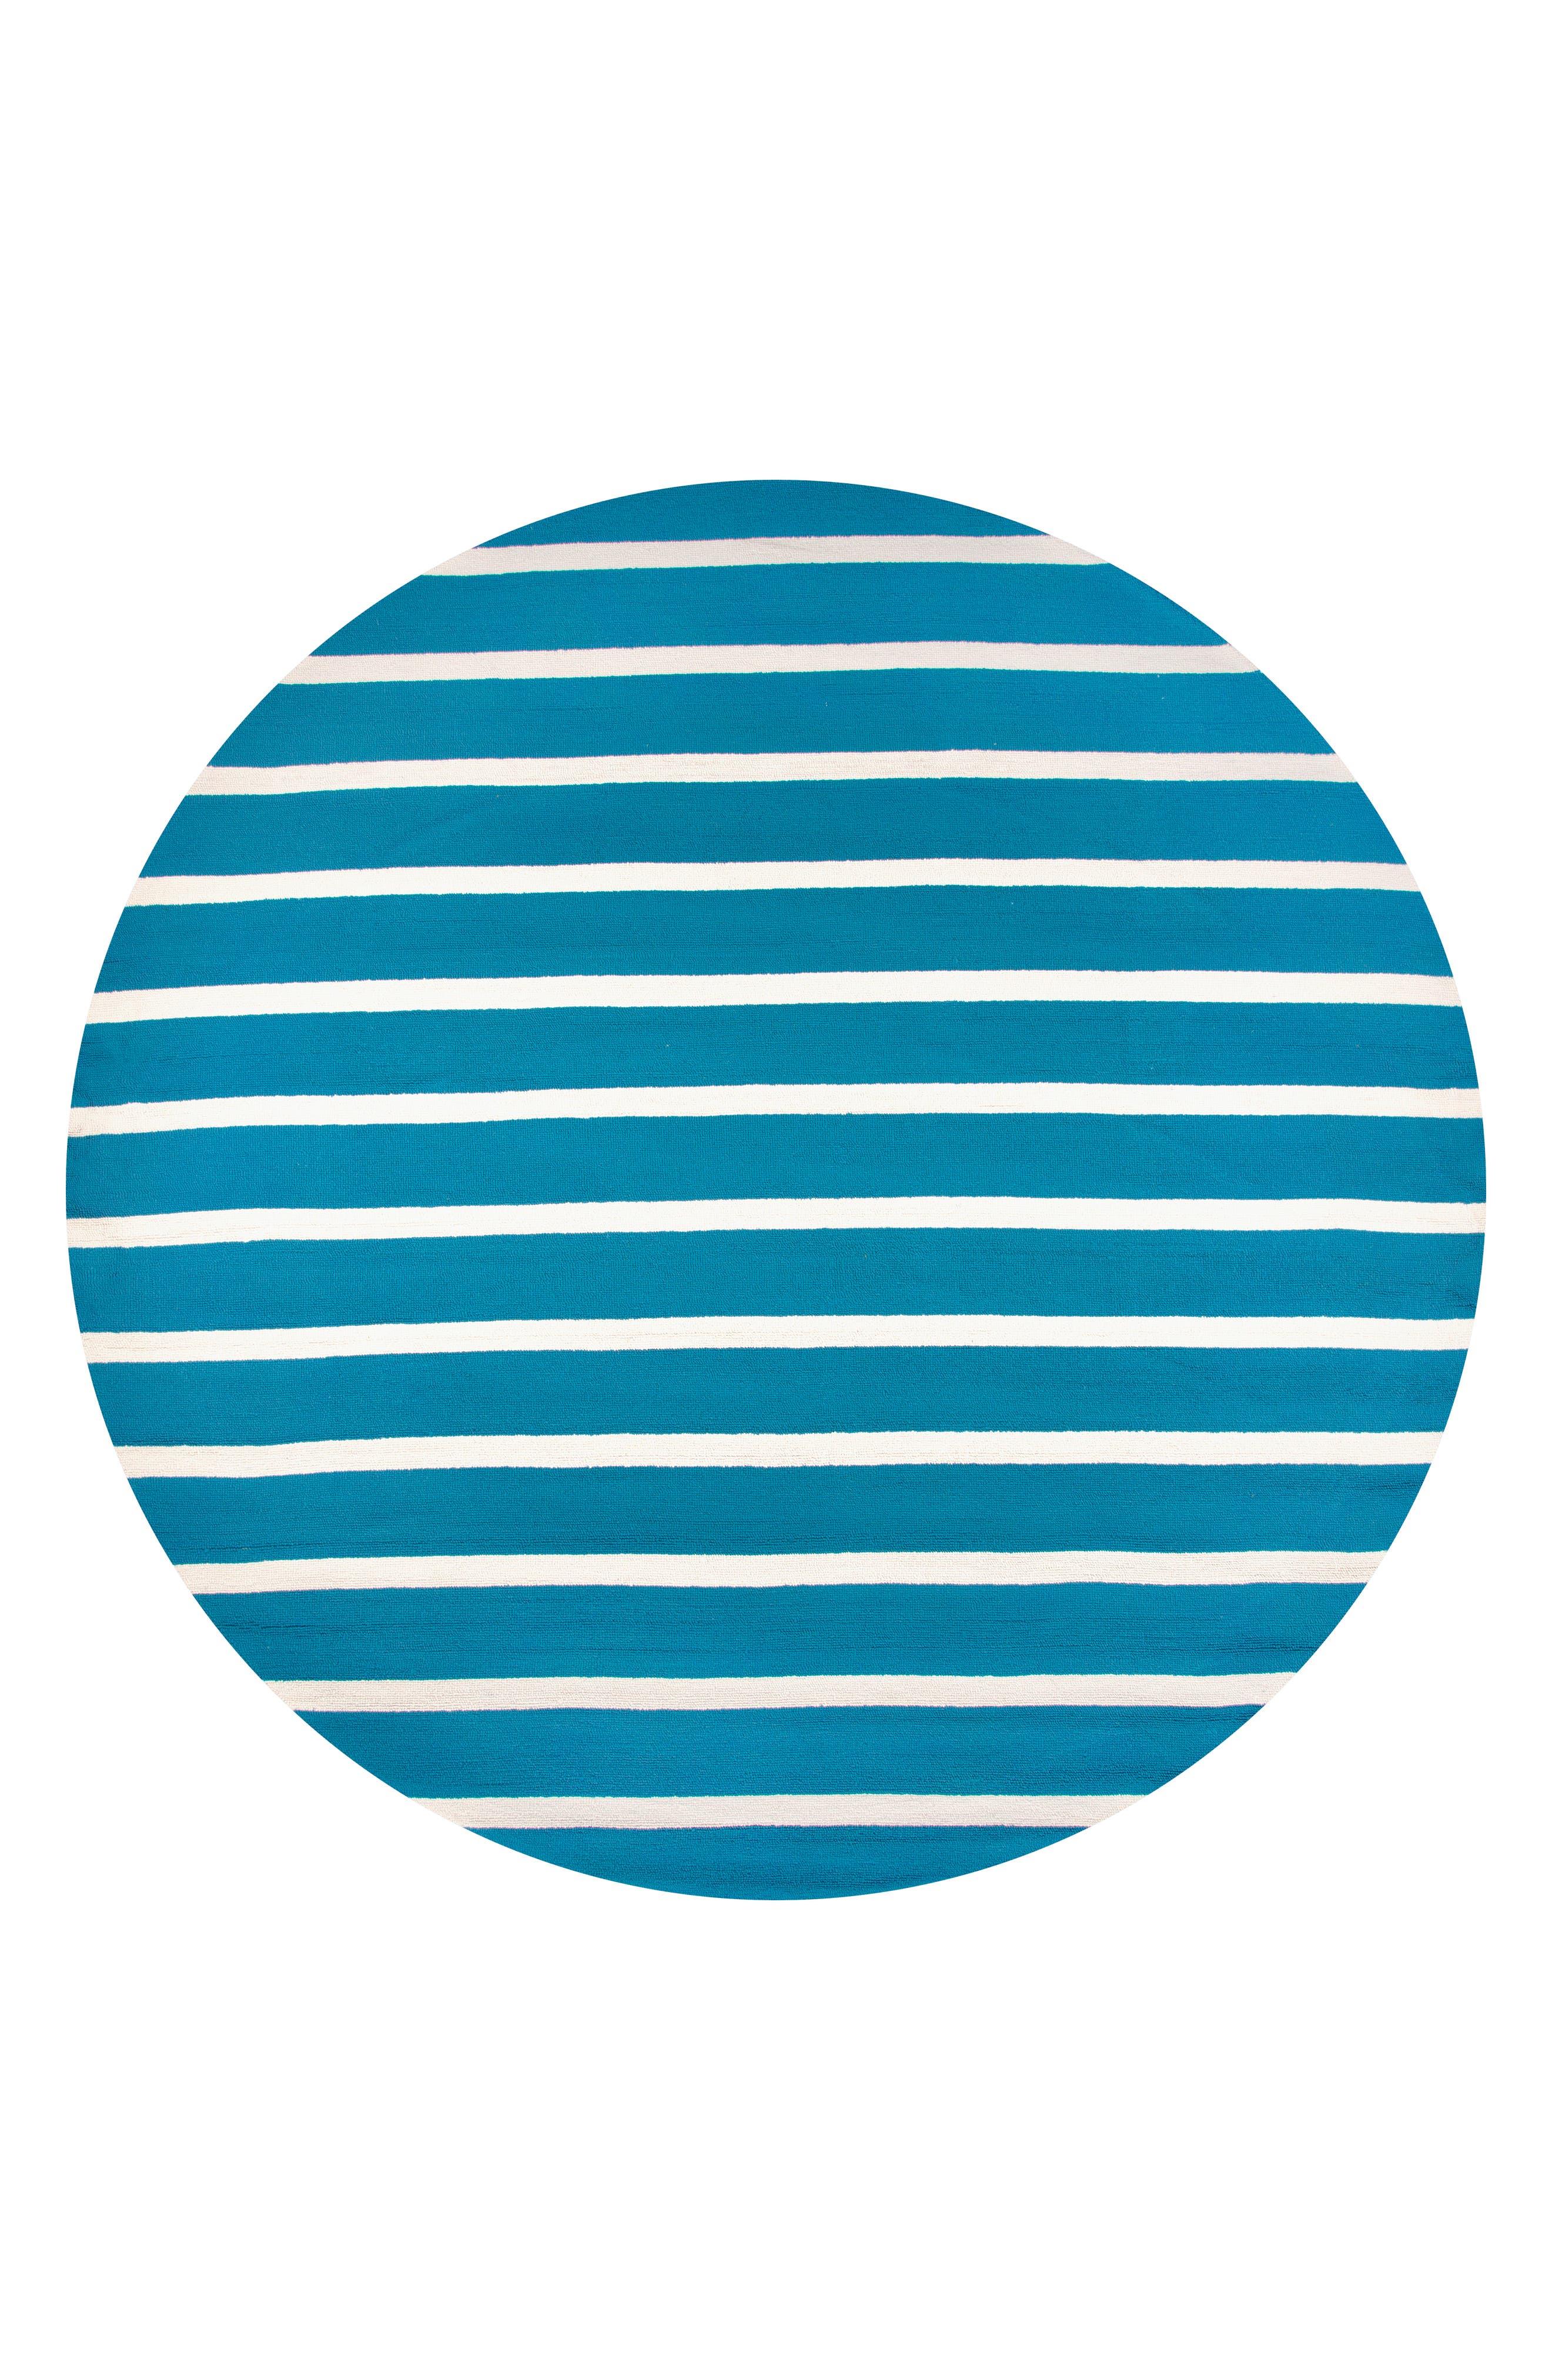 Azzura Hill Jenny Hand Tufted Rug,                             Alternate thumbnail 4, color,                             Marine Blue